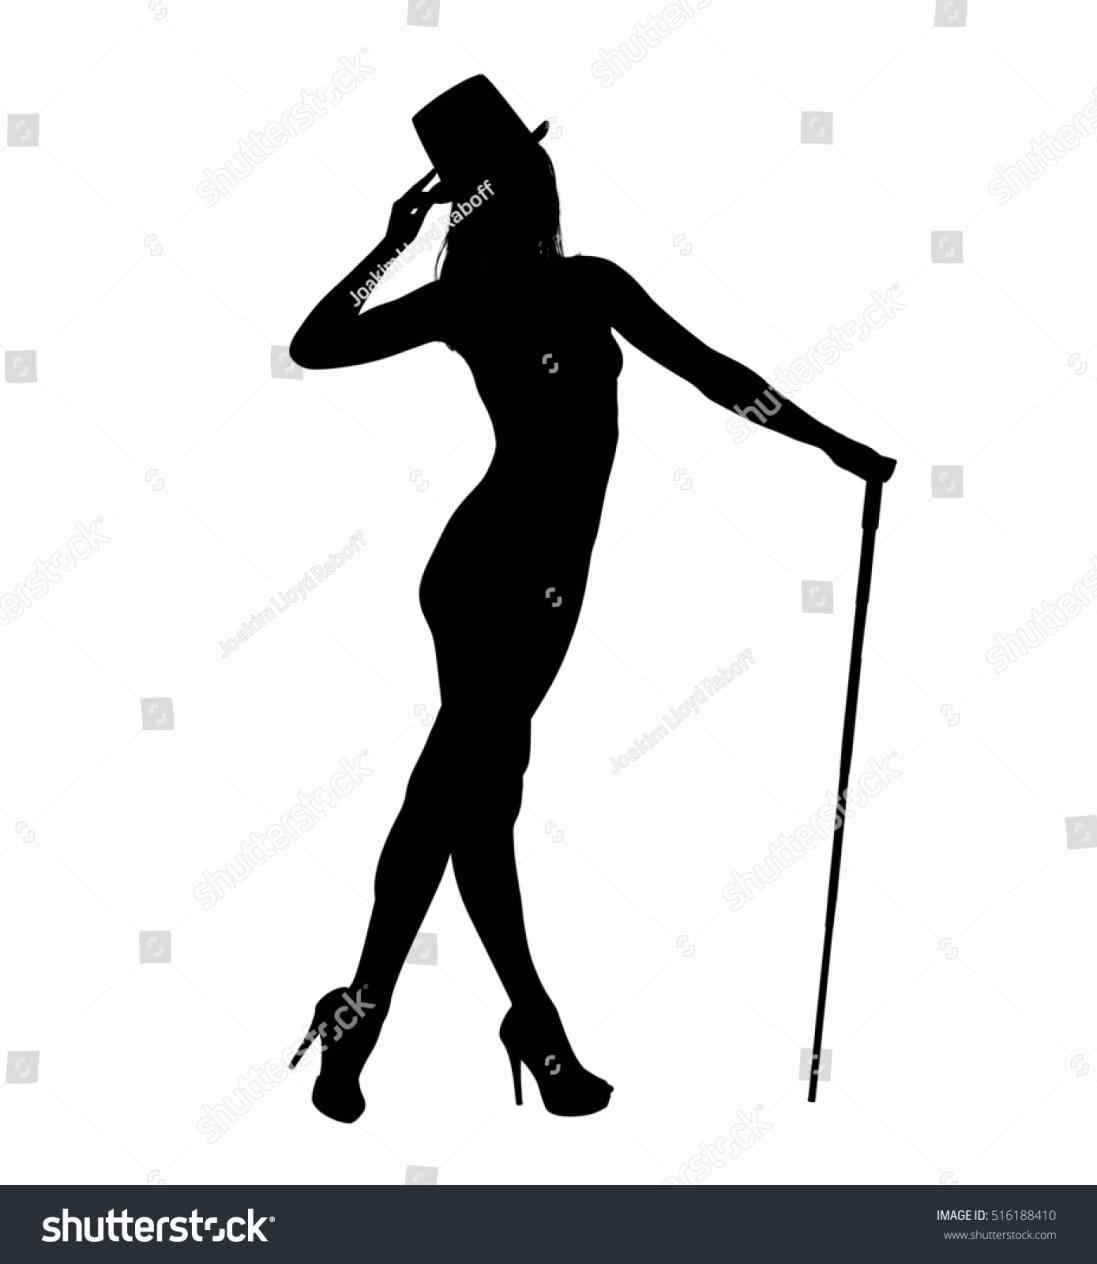 1097x1264 Female Golf Silhouette Borisimage.club